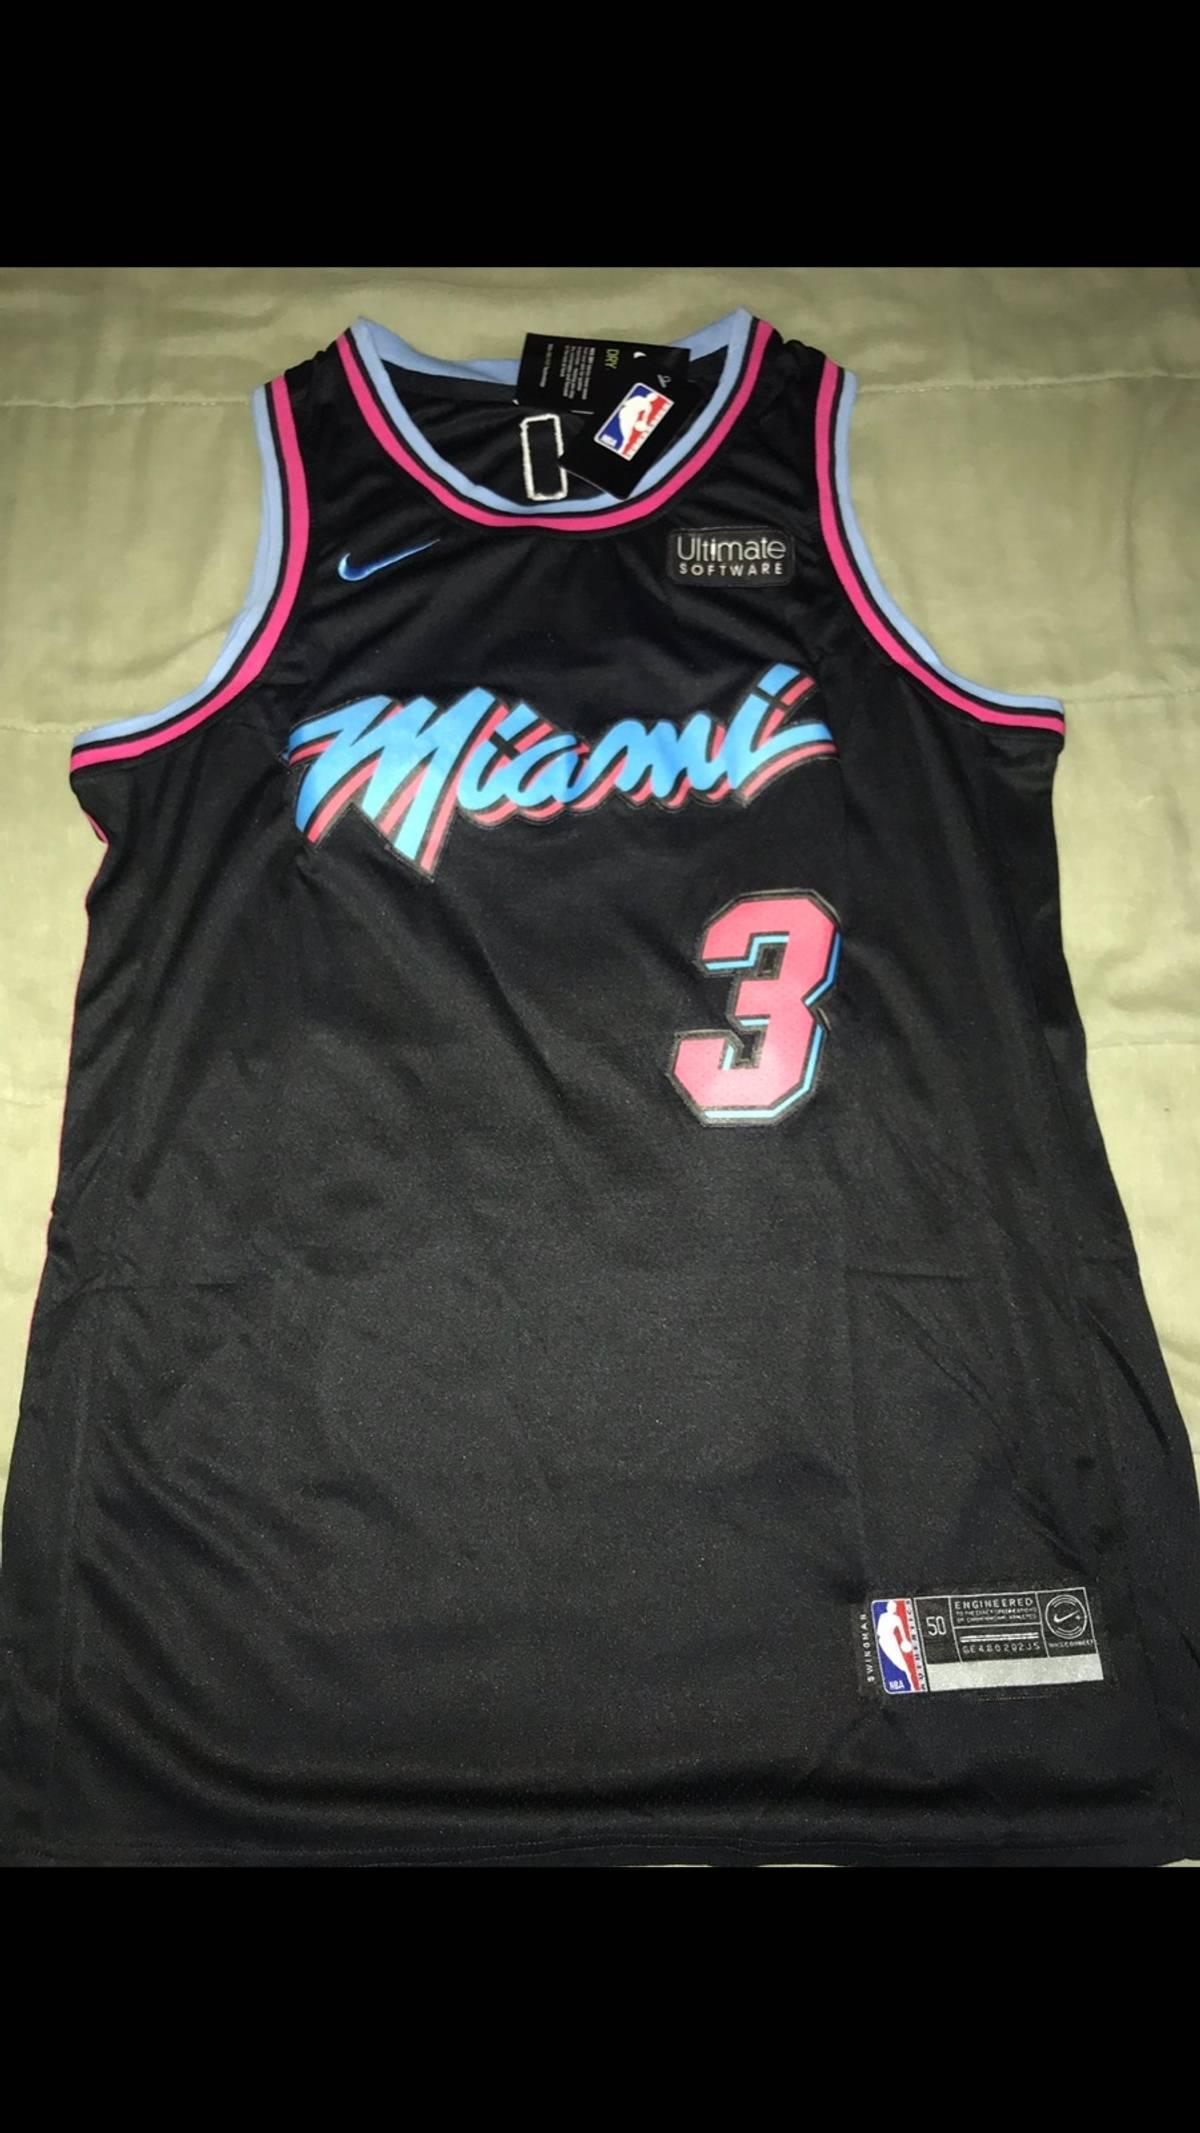 huge selection of 4e2ea c2ab6 Nike Dwyane Wade Miami Vice Black Nba One Last Dance Jersey Nine Size L $40